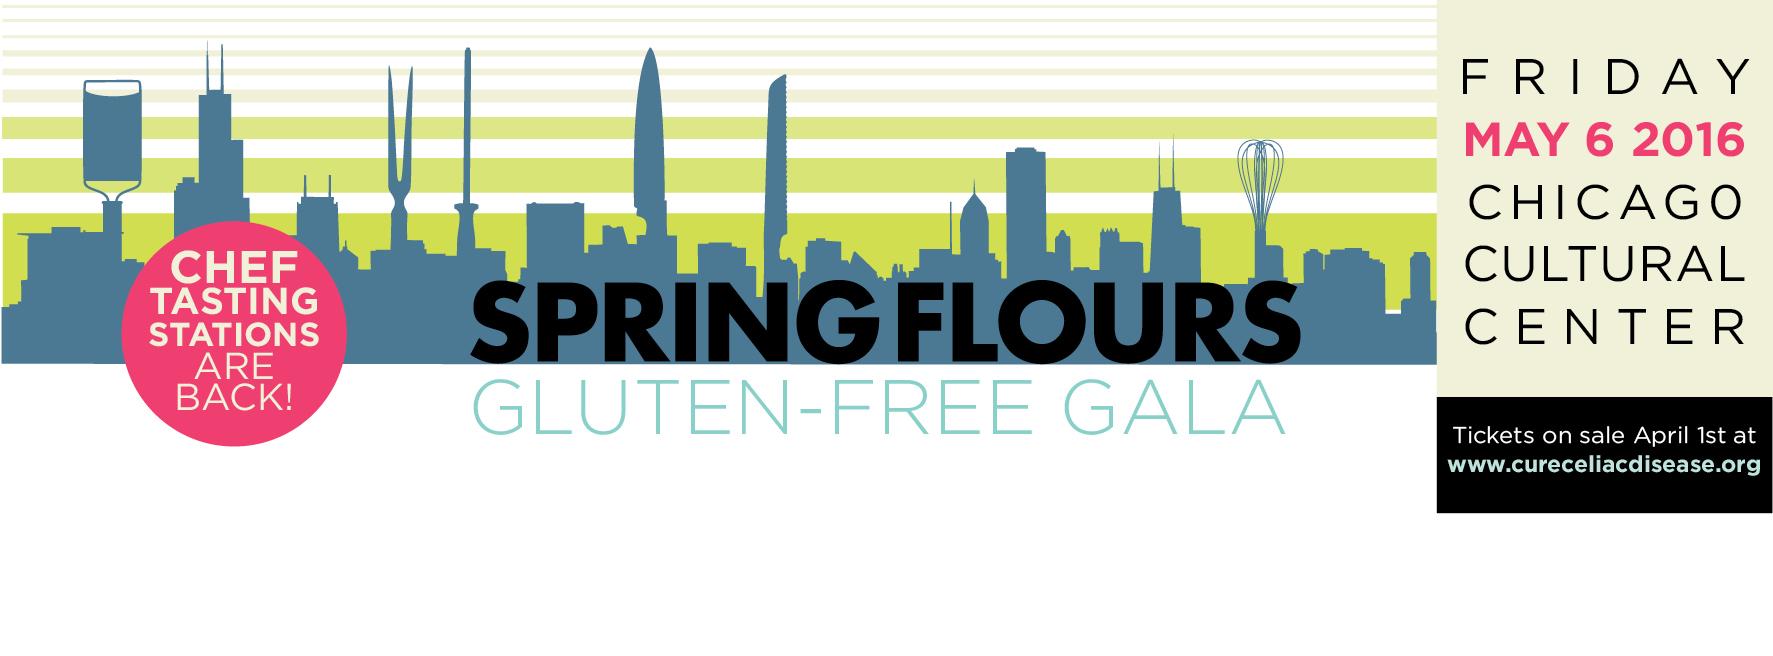 Spring Flours Gluten-Free Gala 2016